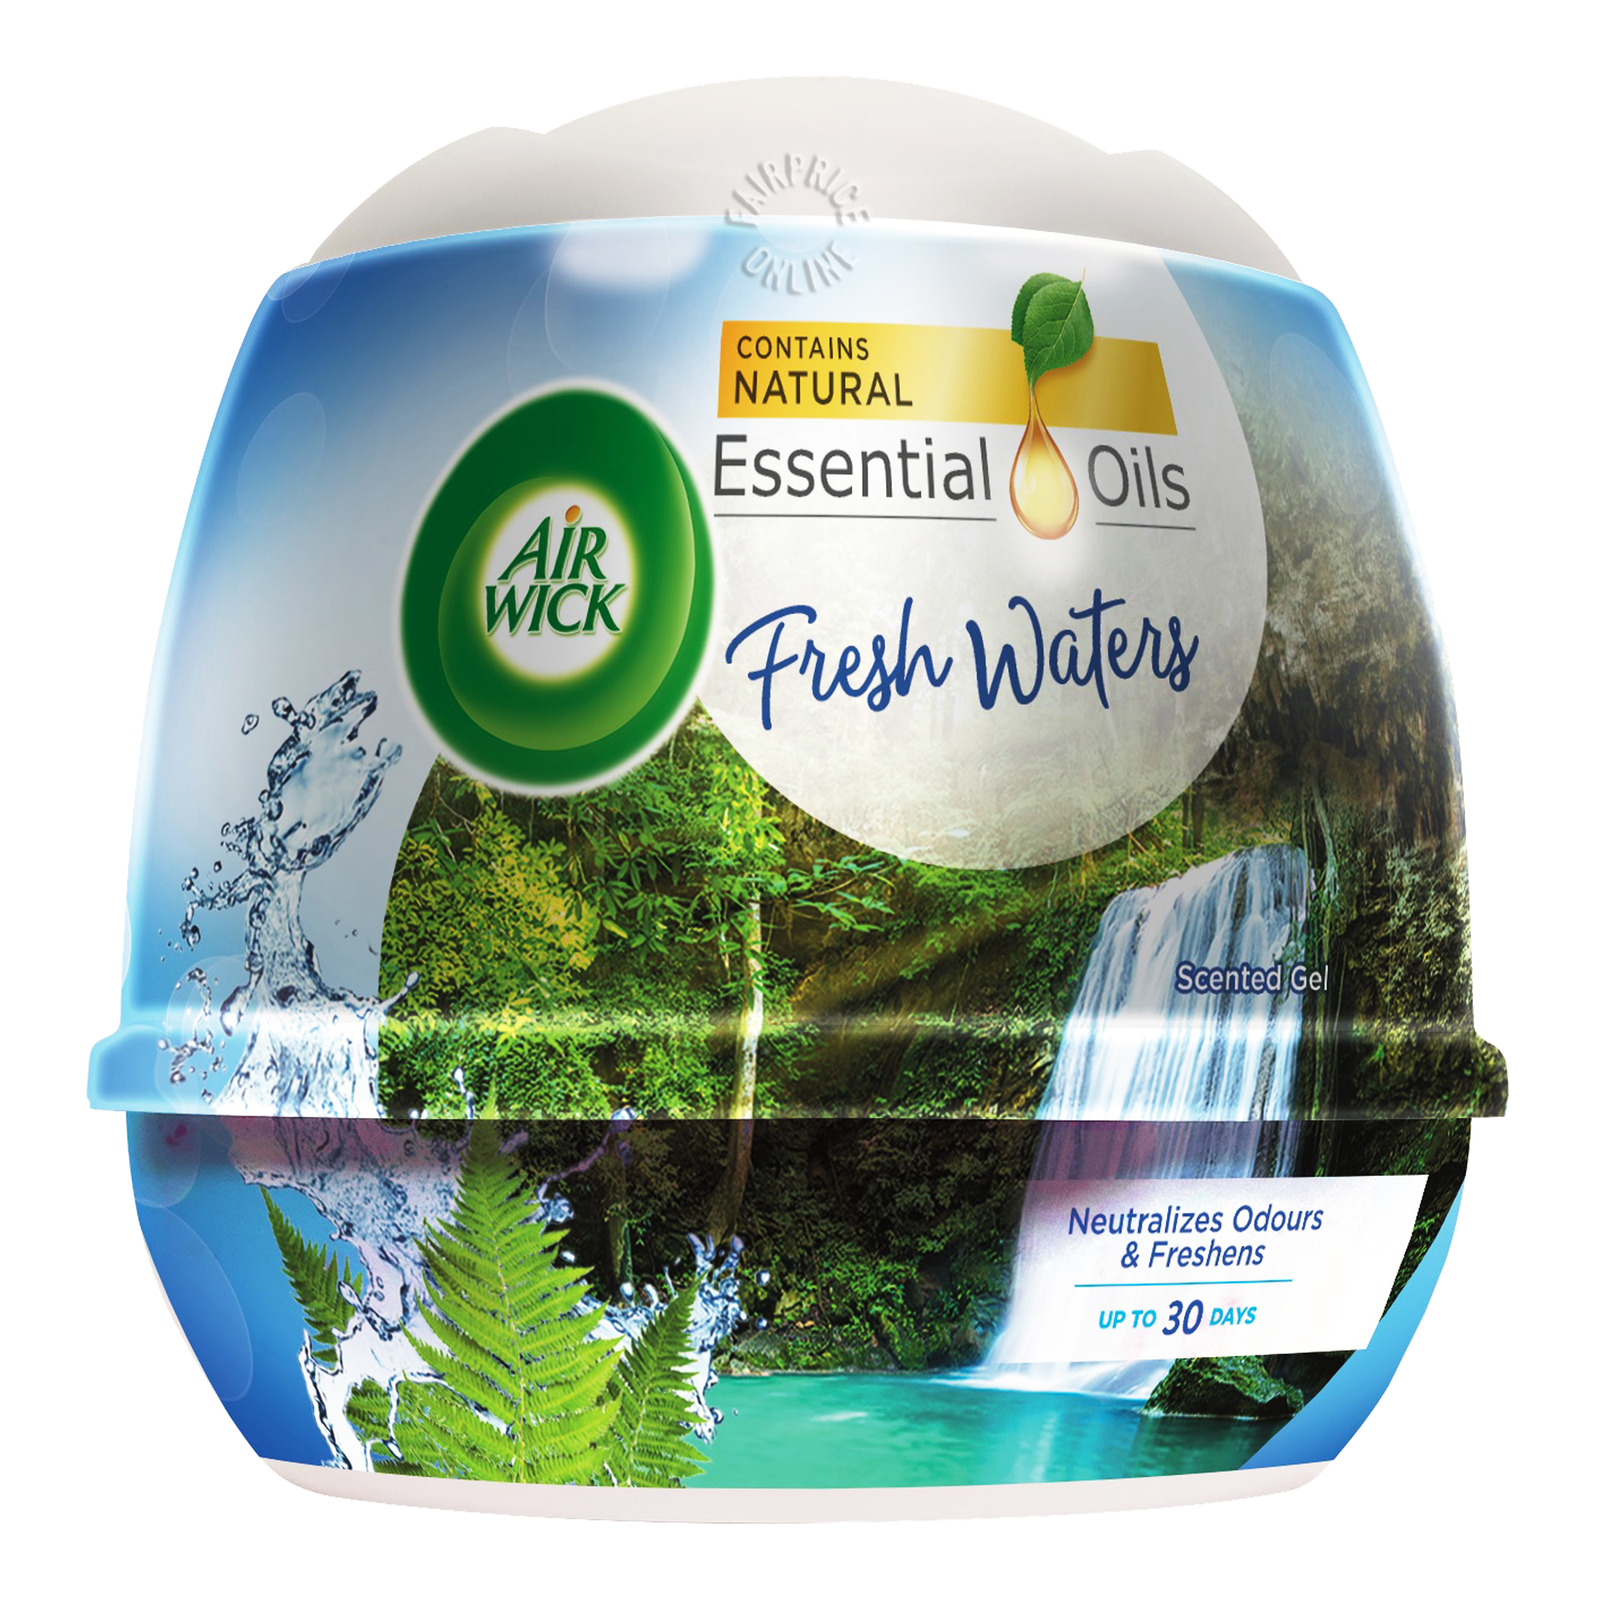 Airwick Scented Gel - Fresh Water